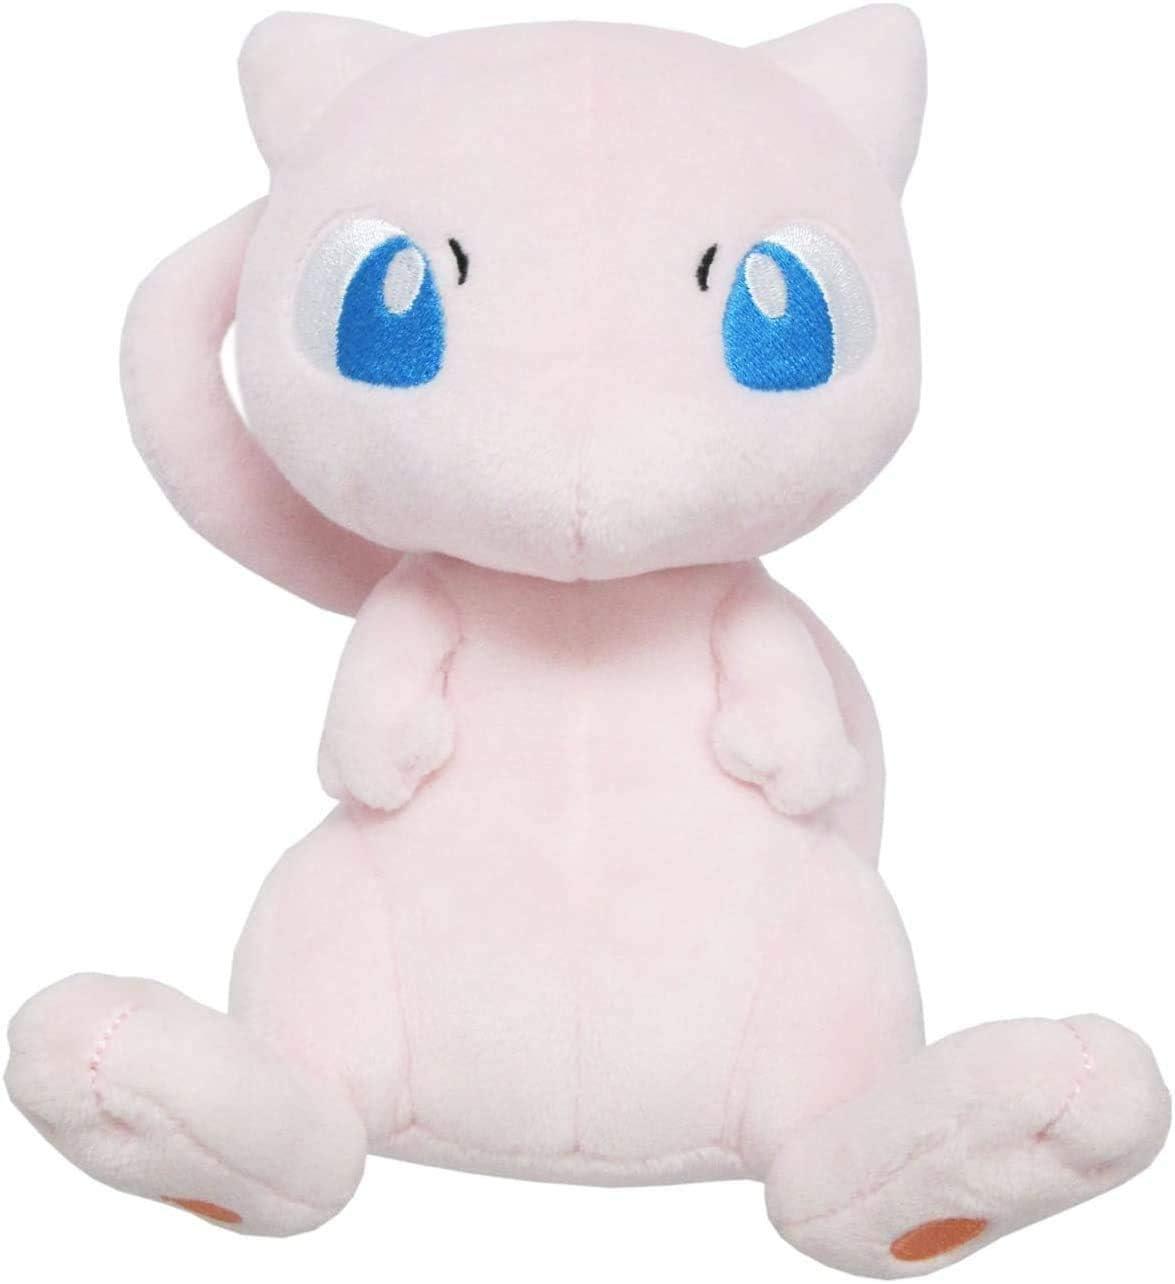 Pokémon Mewtwo Plush Doll, 6.5-inch Plush Toy